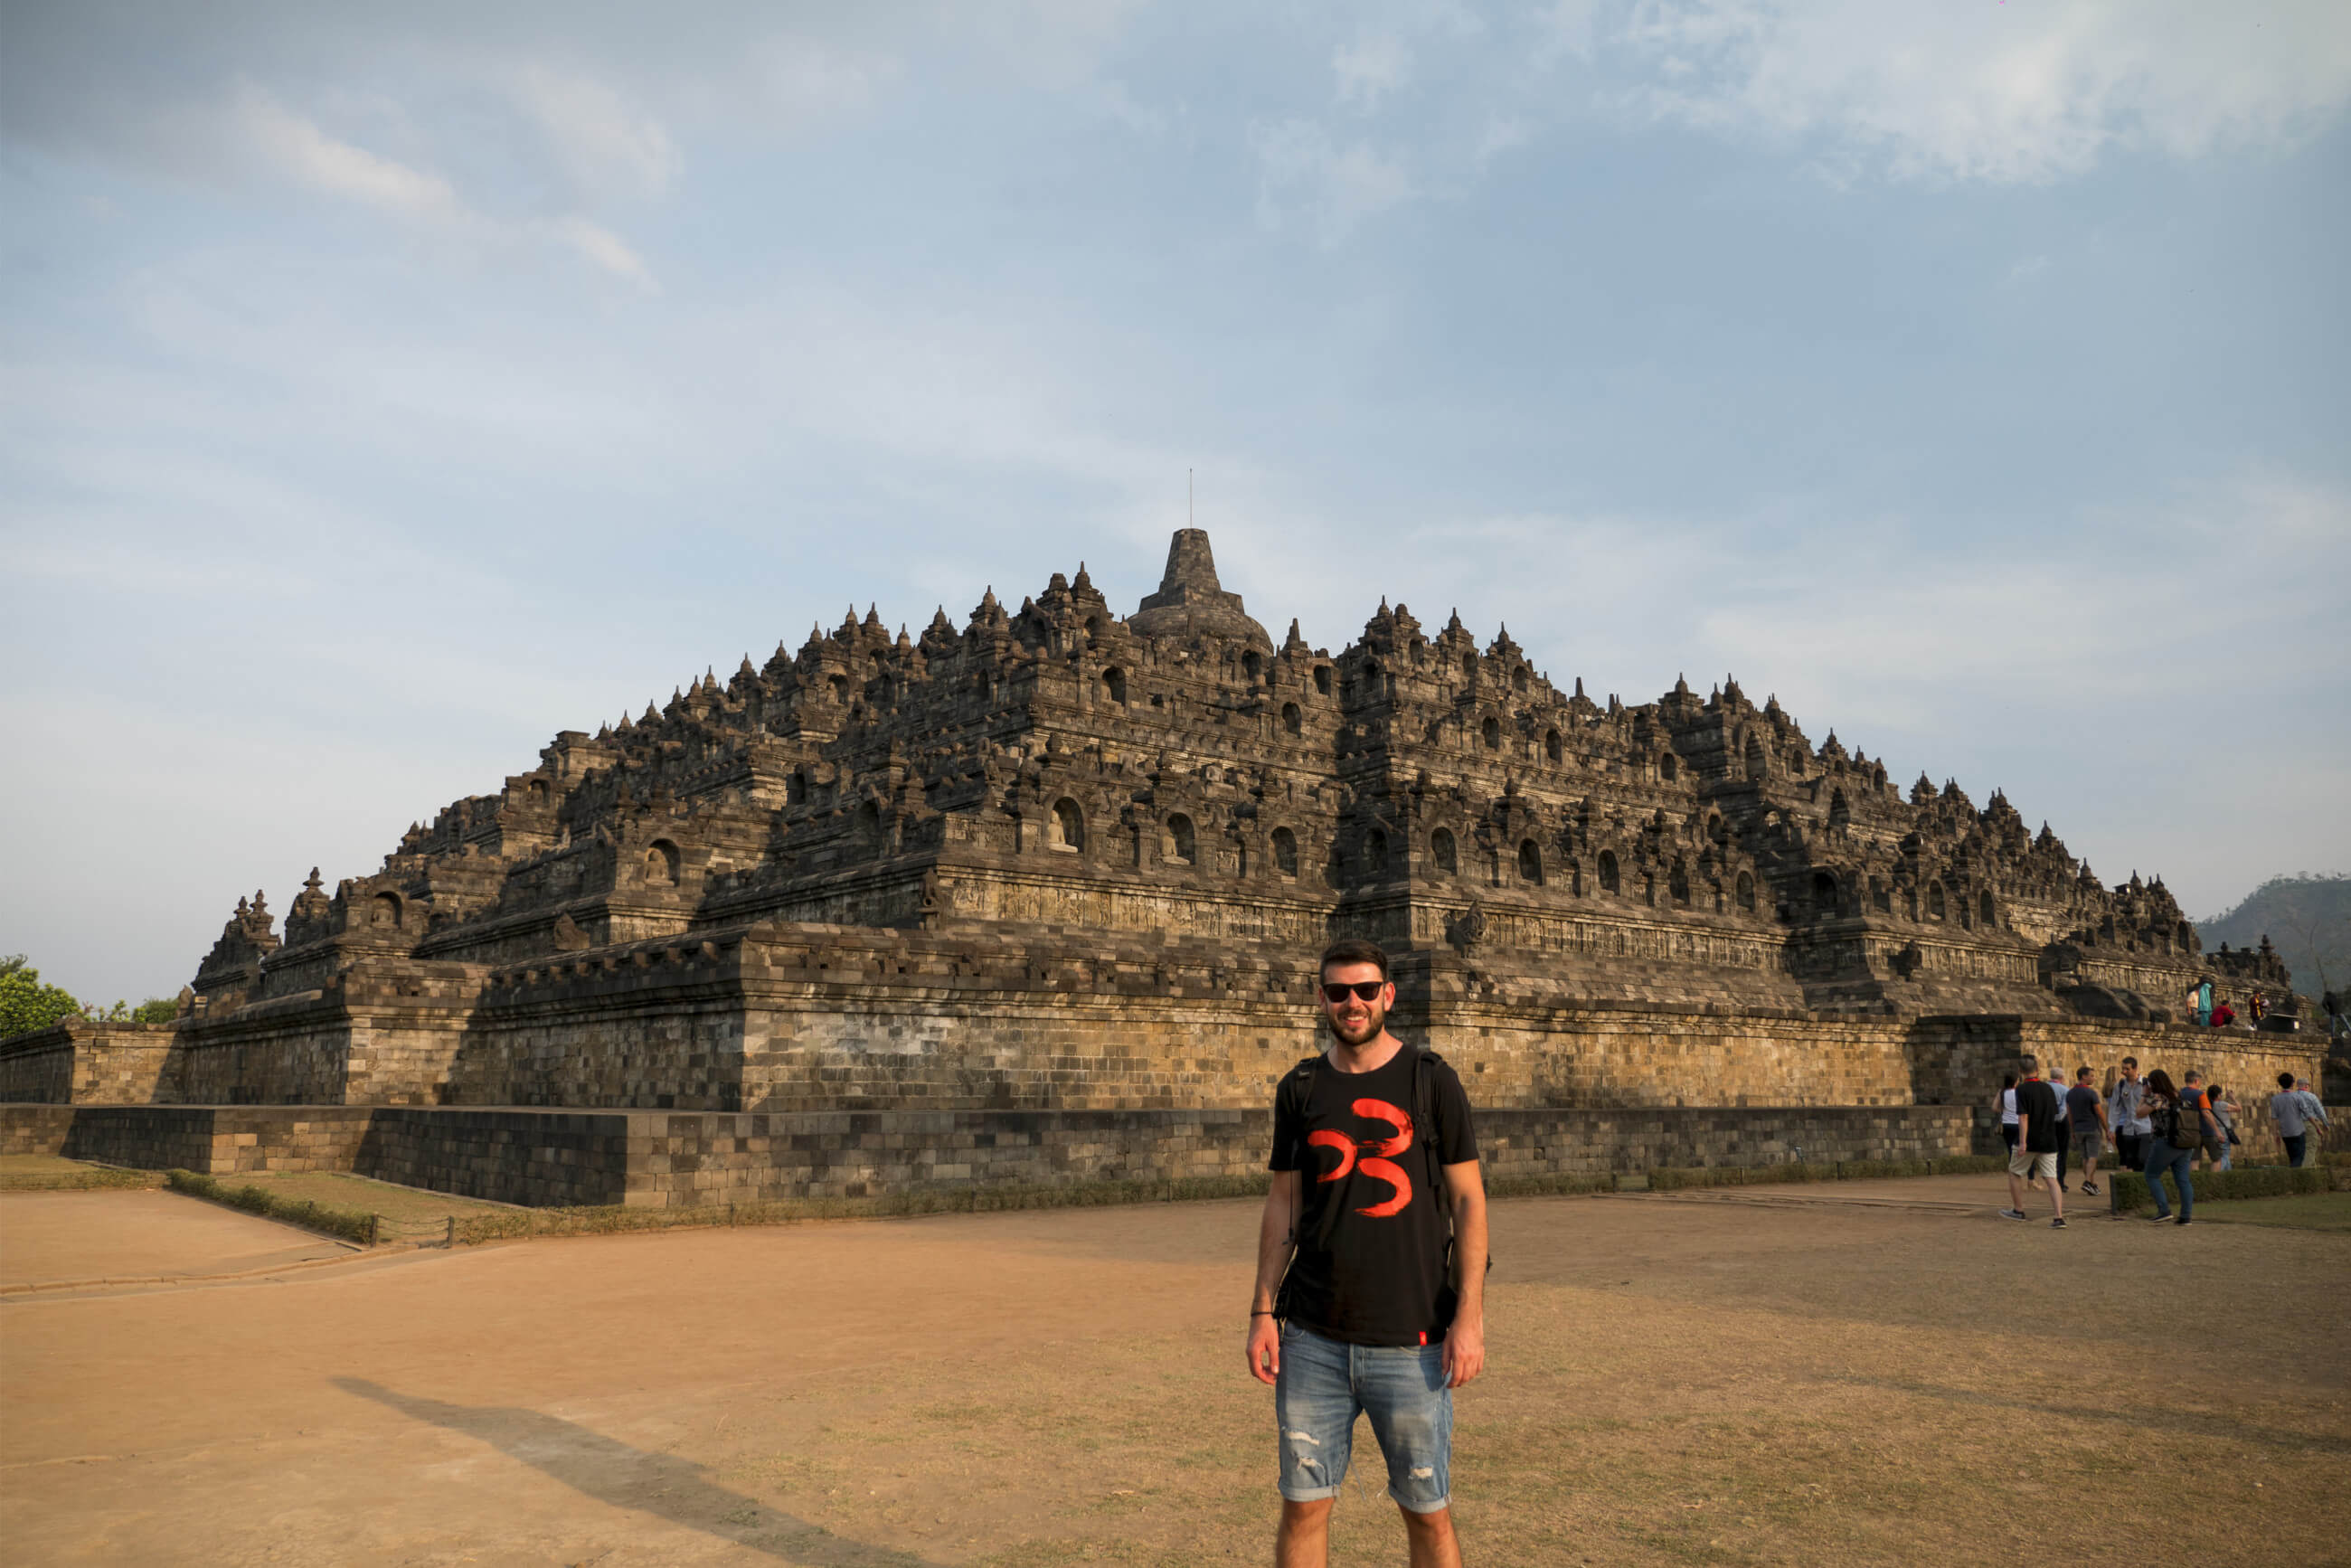 https://bubo.sk/uploads/galleries/4921/martin_simko_indonezia_java_borobudur.jpg